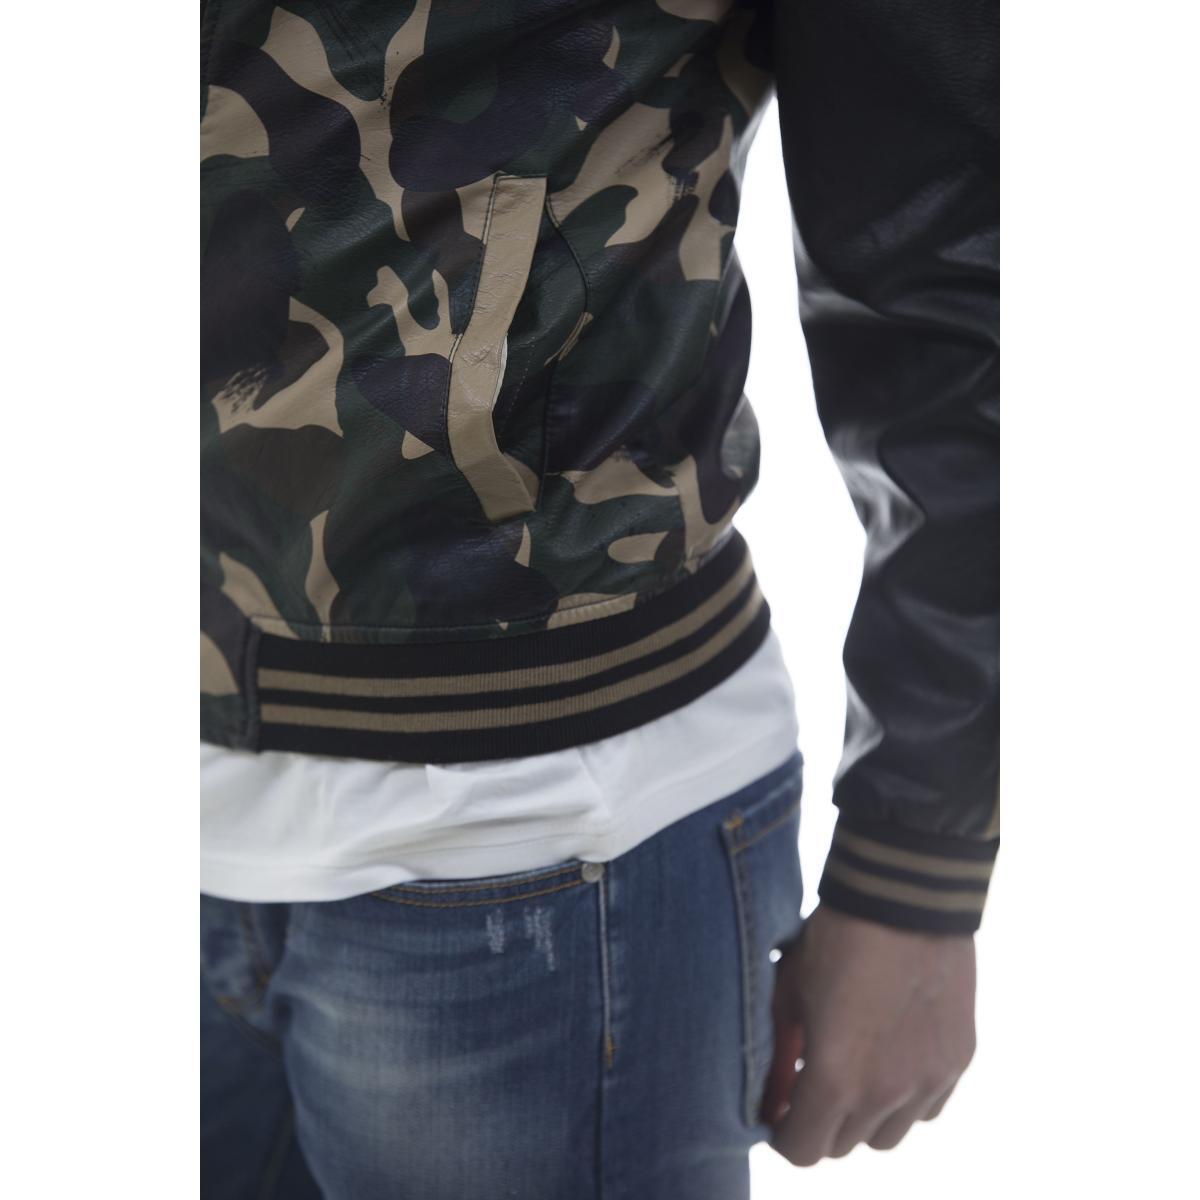 Giacca giubbotto ecopelle camouflage nero - uomo